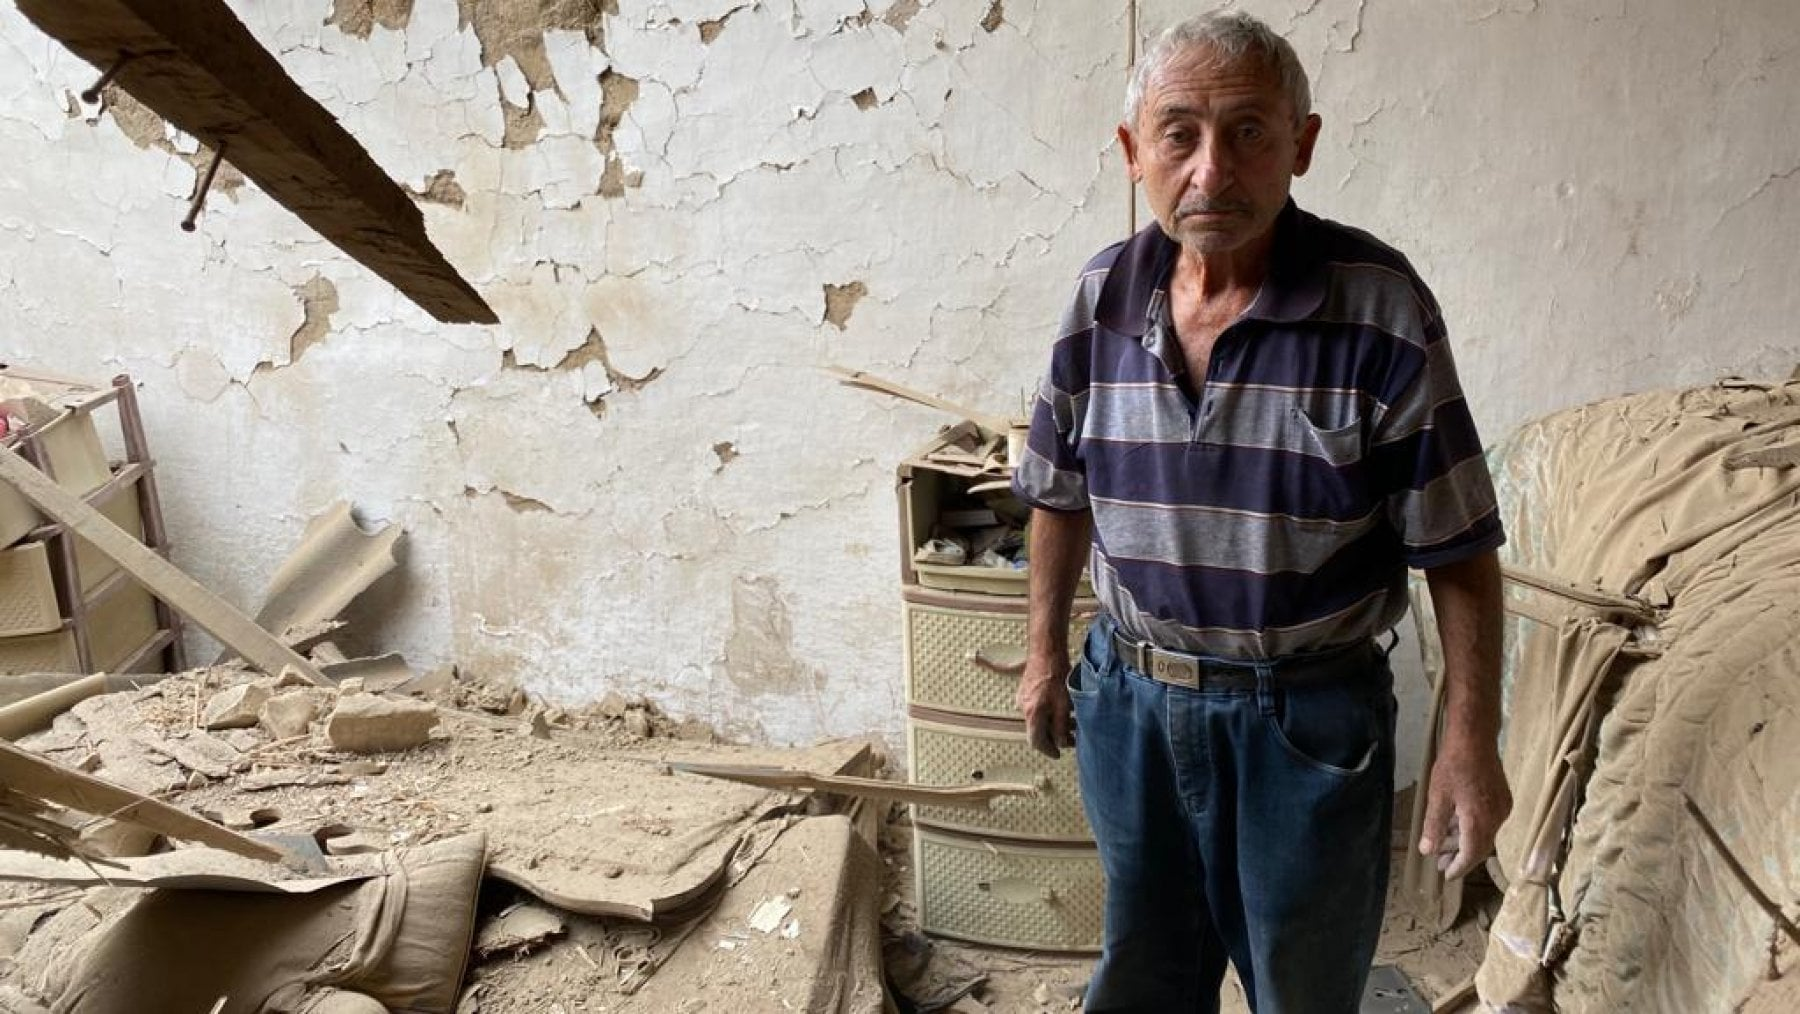 215830759 3fc0ce3b 1059 4819 81fa f8964410e59b - Nagorno-Karabakh, Armenia e Azerbaijan annunciano tregua umanitaria